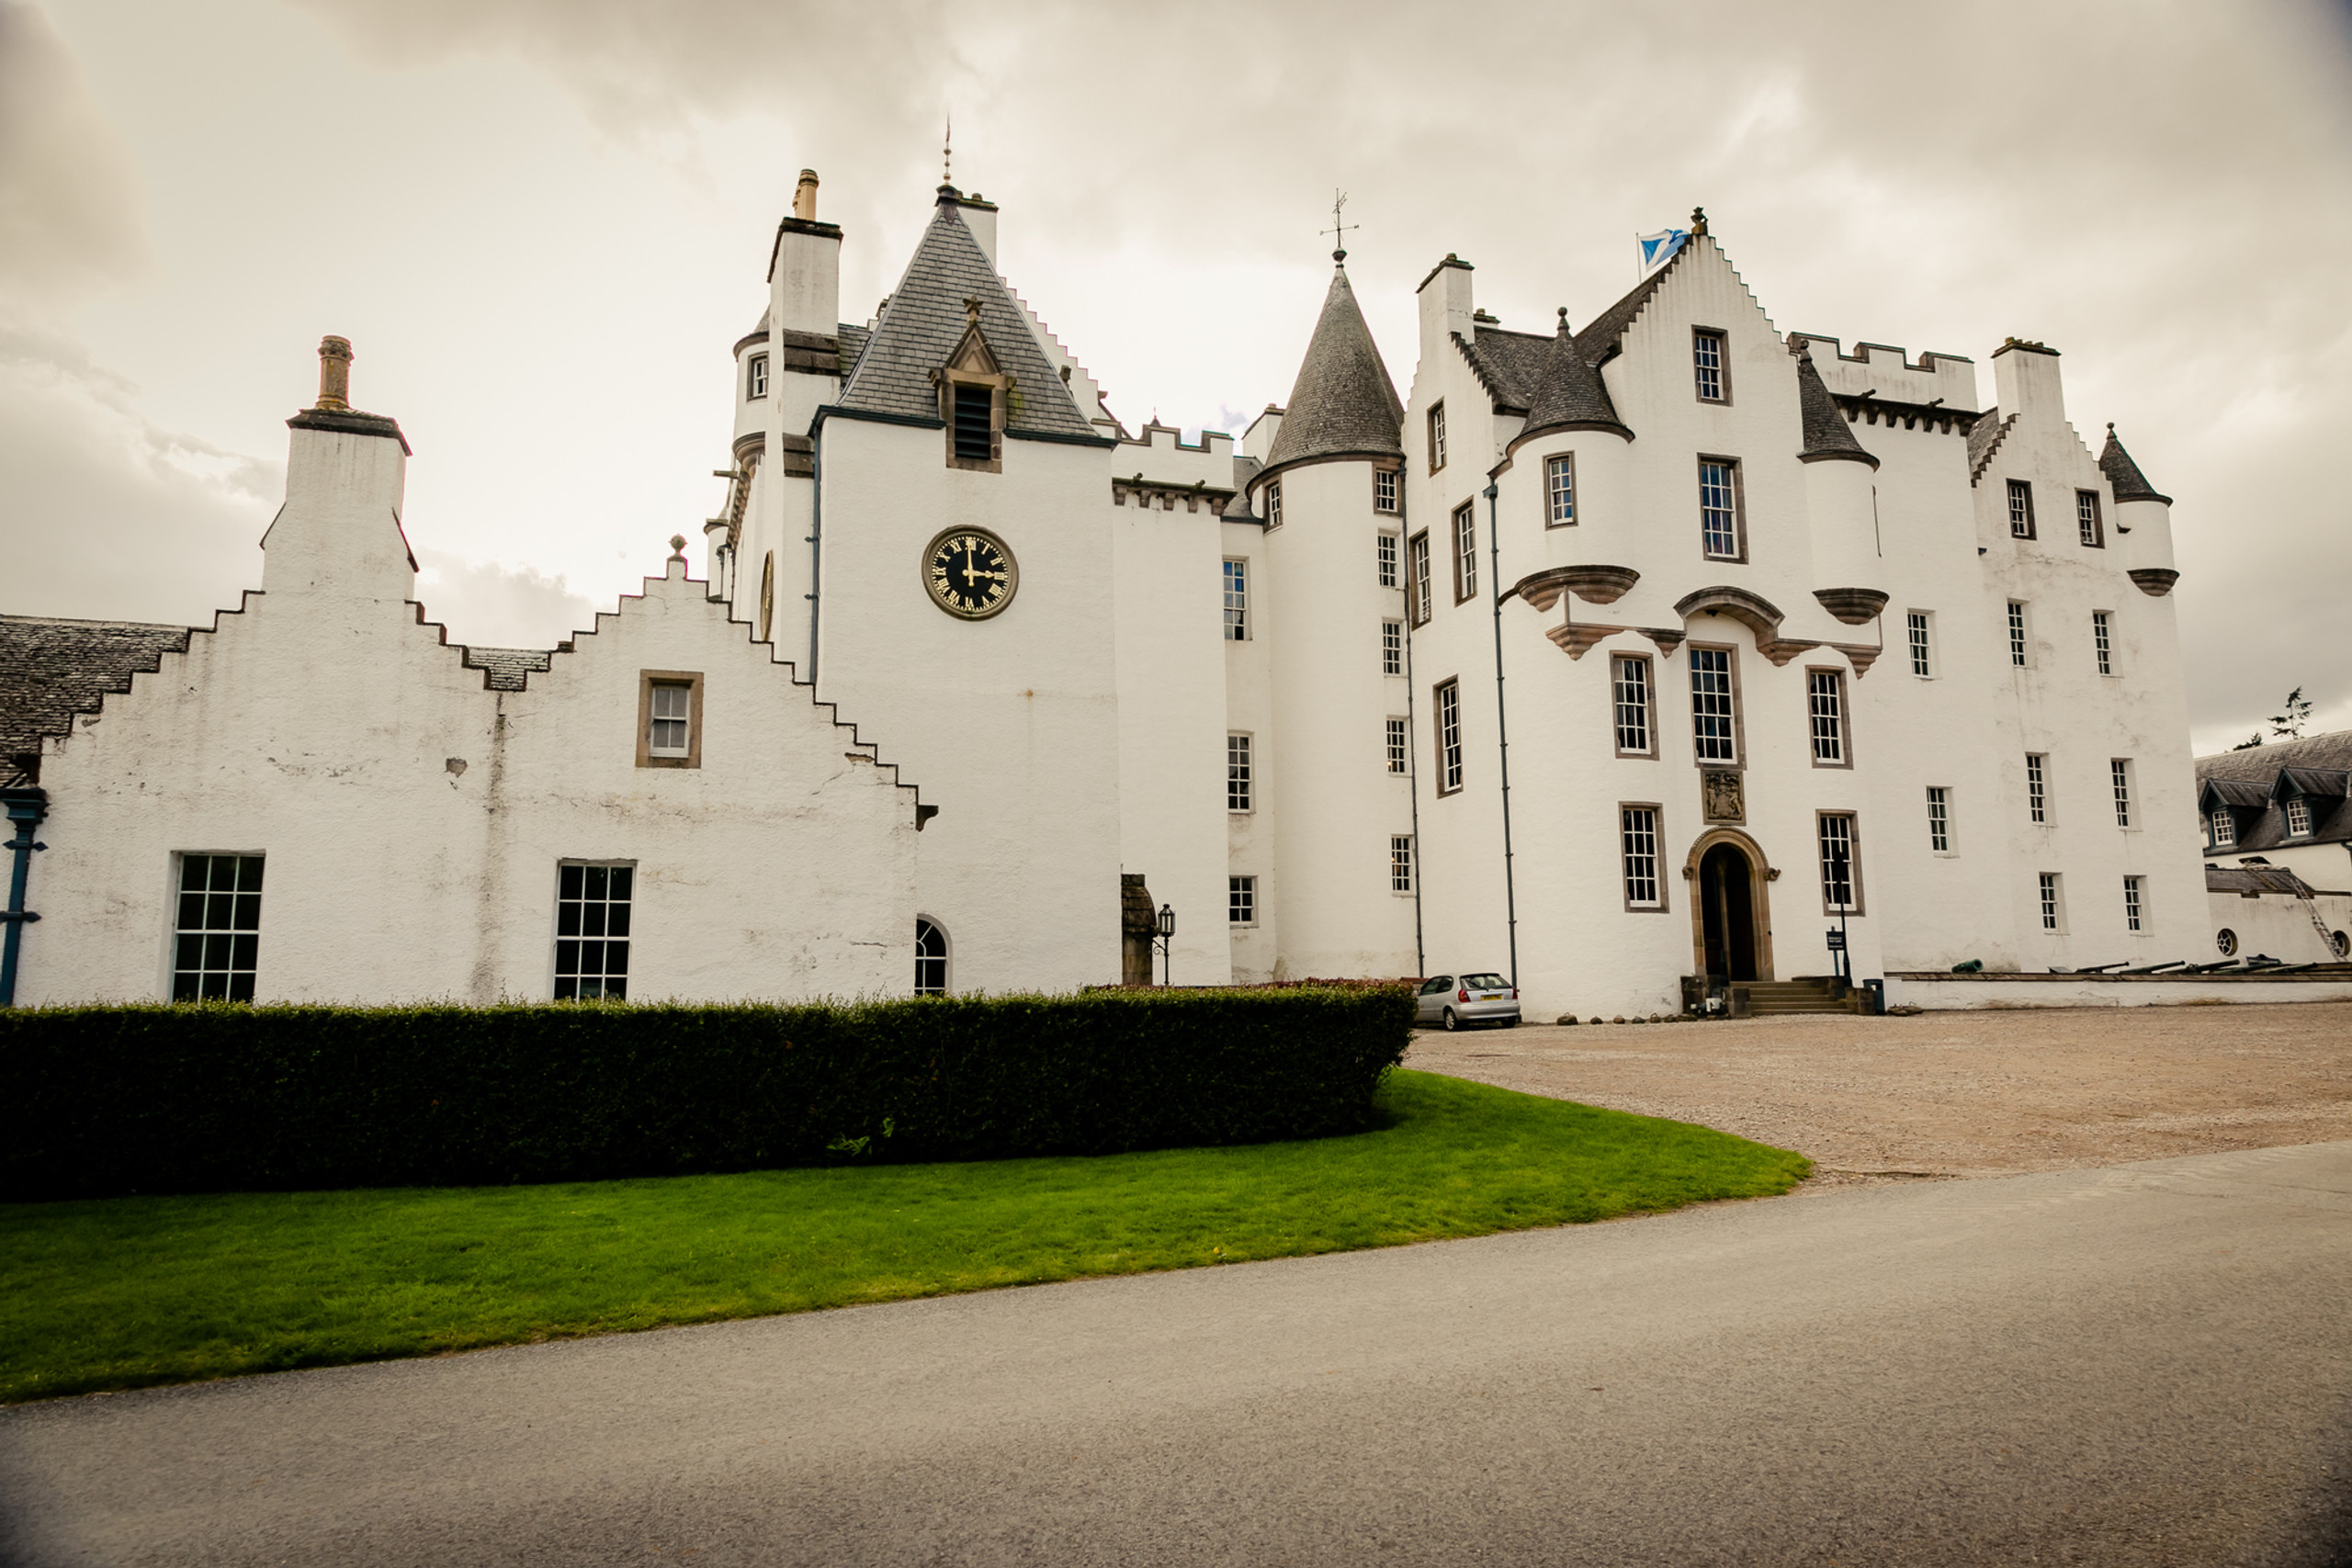 The Blair Castle in Scottish Highlands. Scotland, landscapes, castle